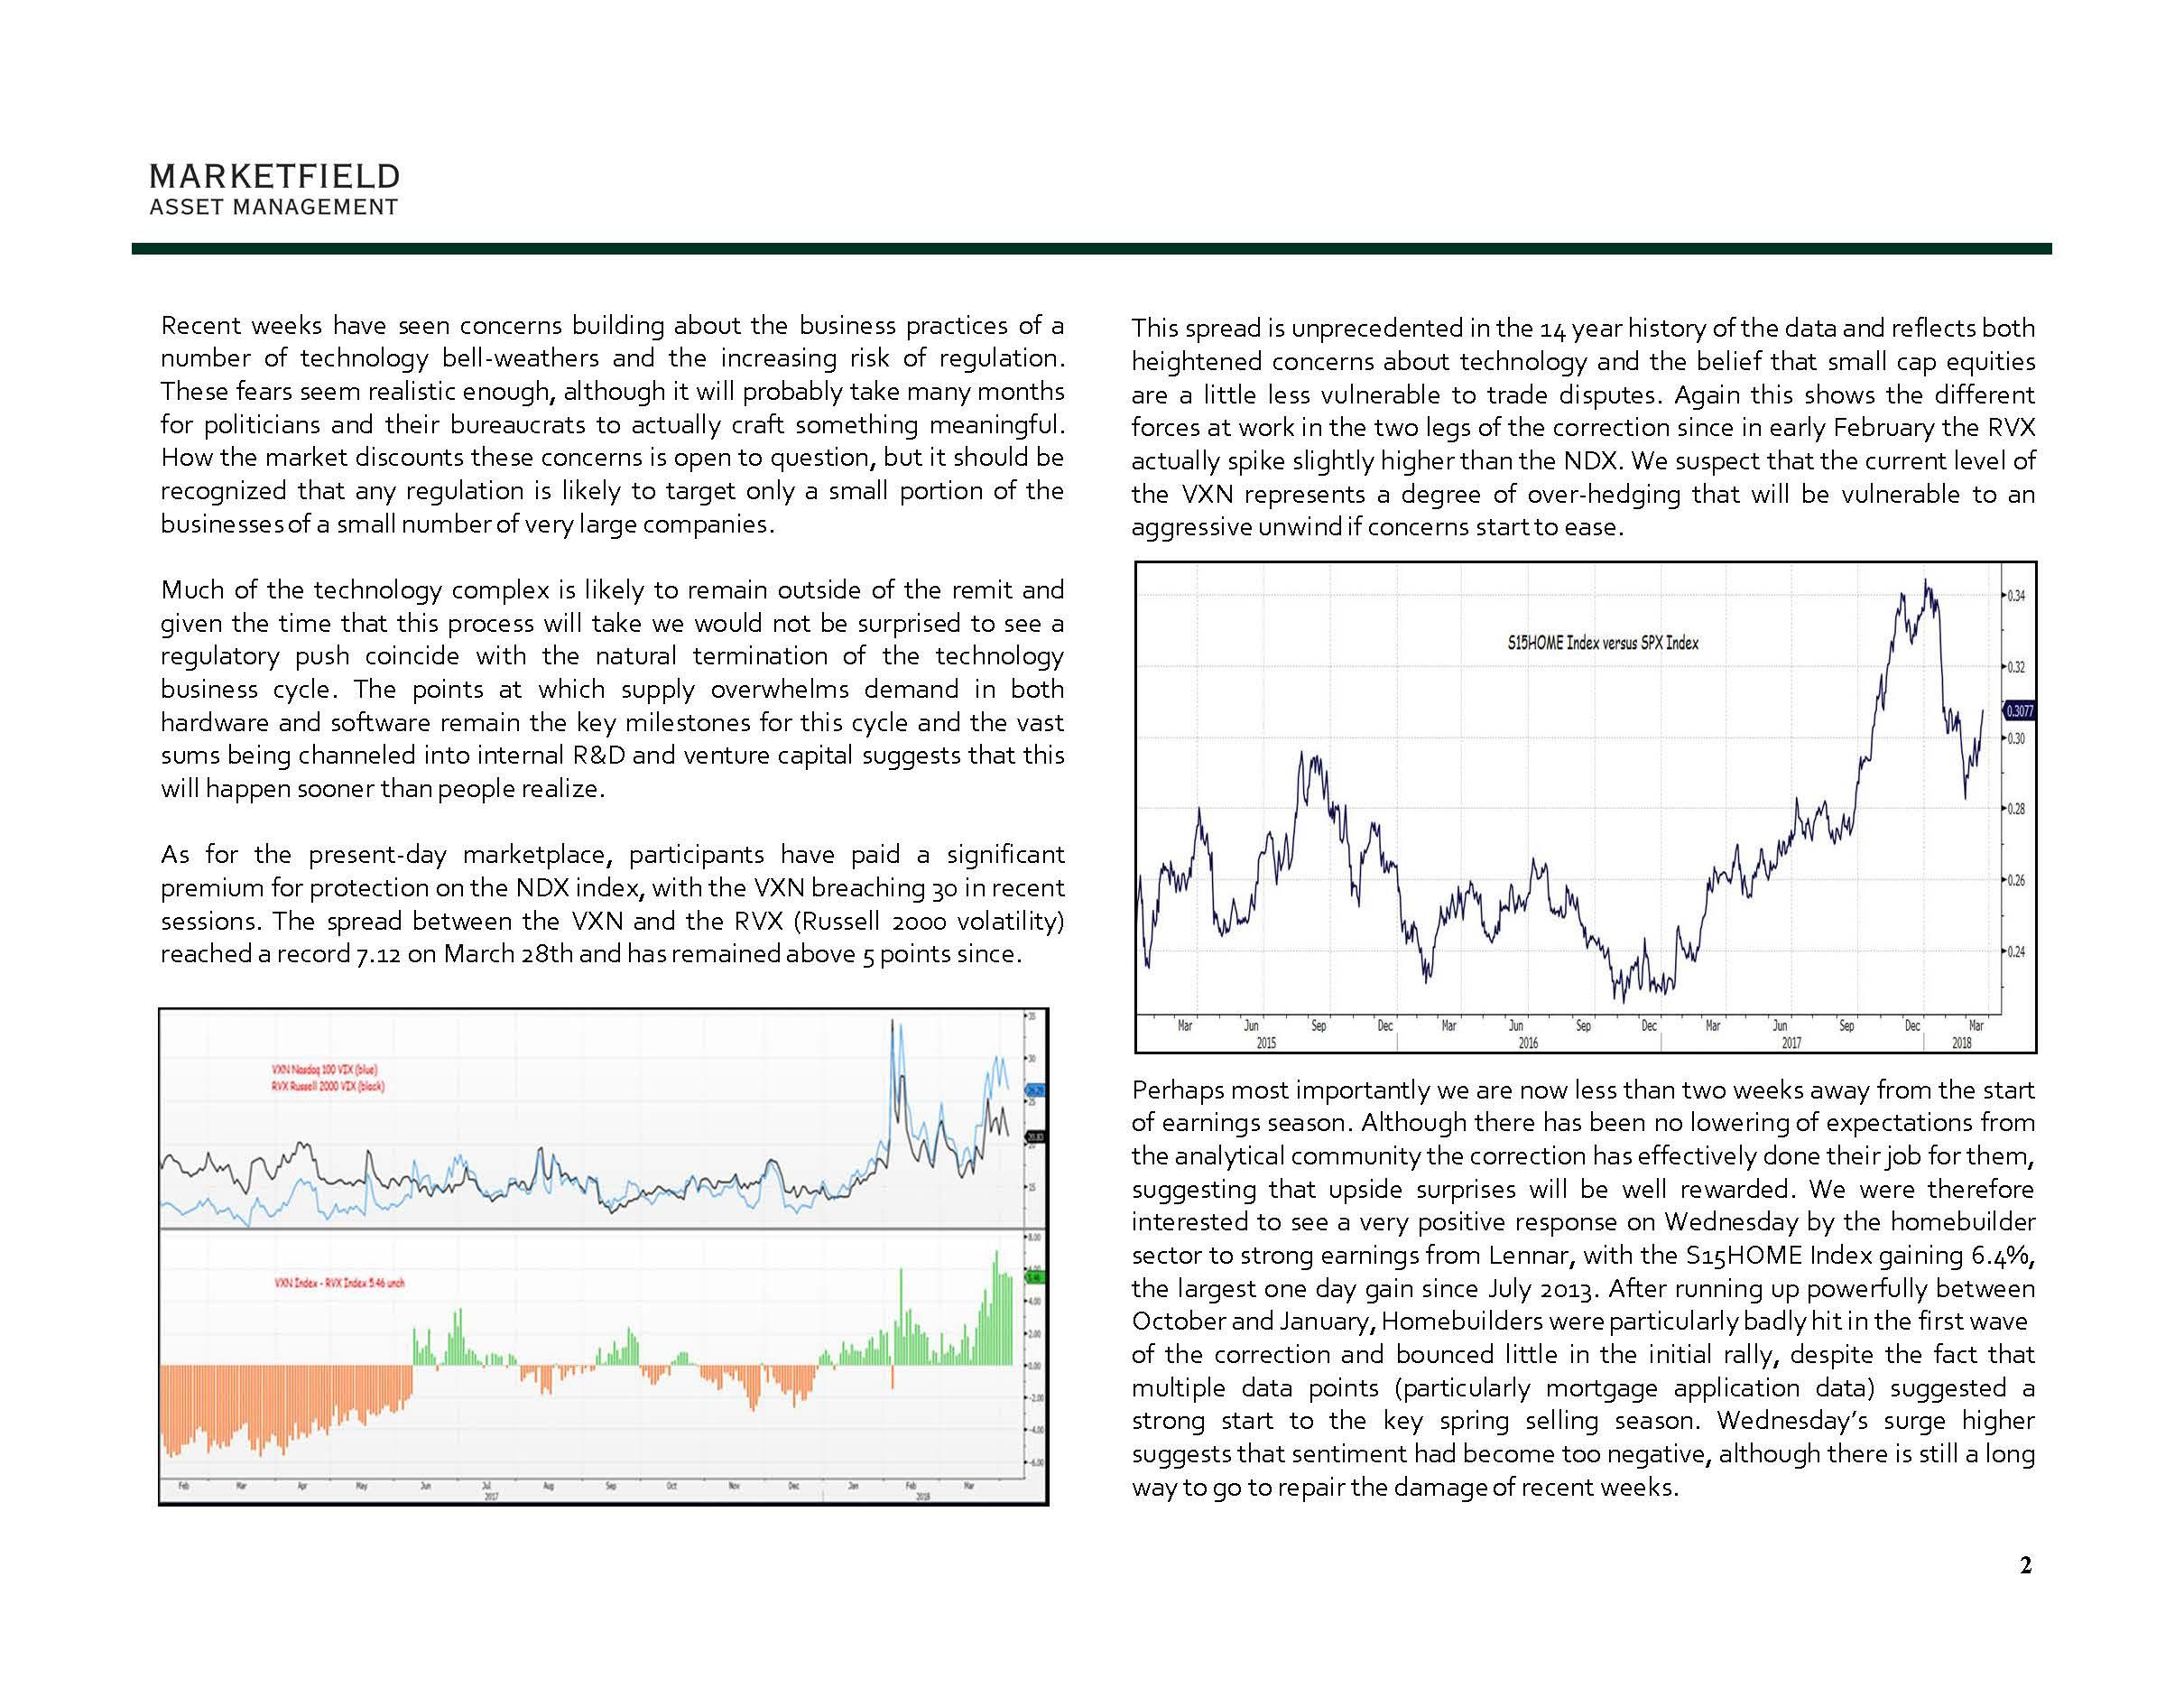 April 5_Marketfield Weekly Speculator_Page_02.jpg